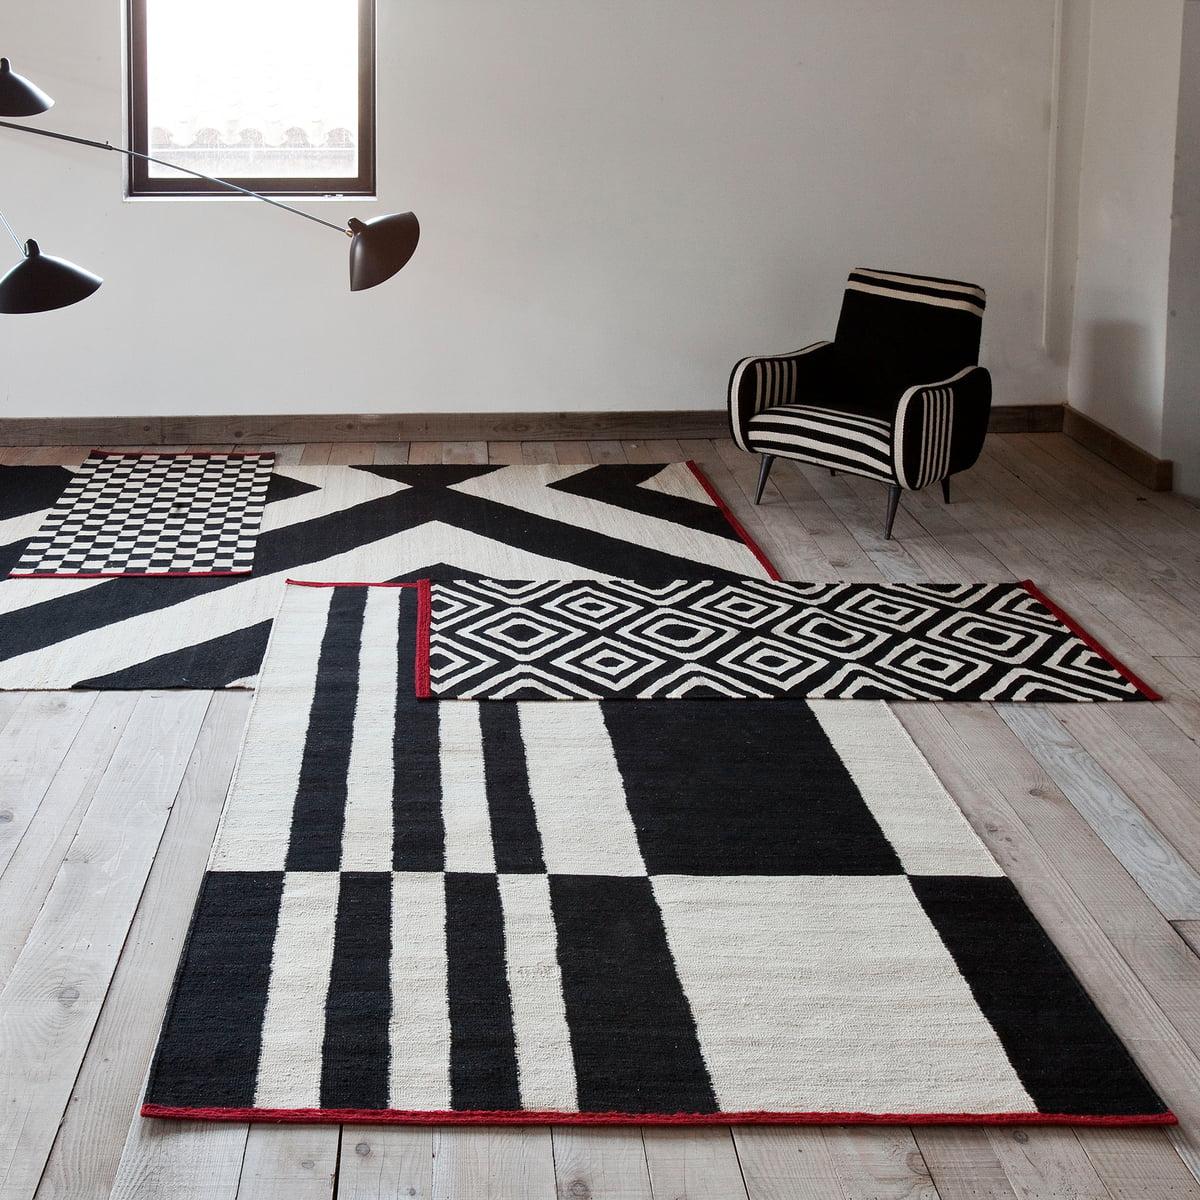 Https Www Connox Com Categories Home Textiles Rugs Nanimarquina